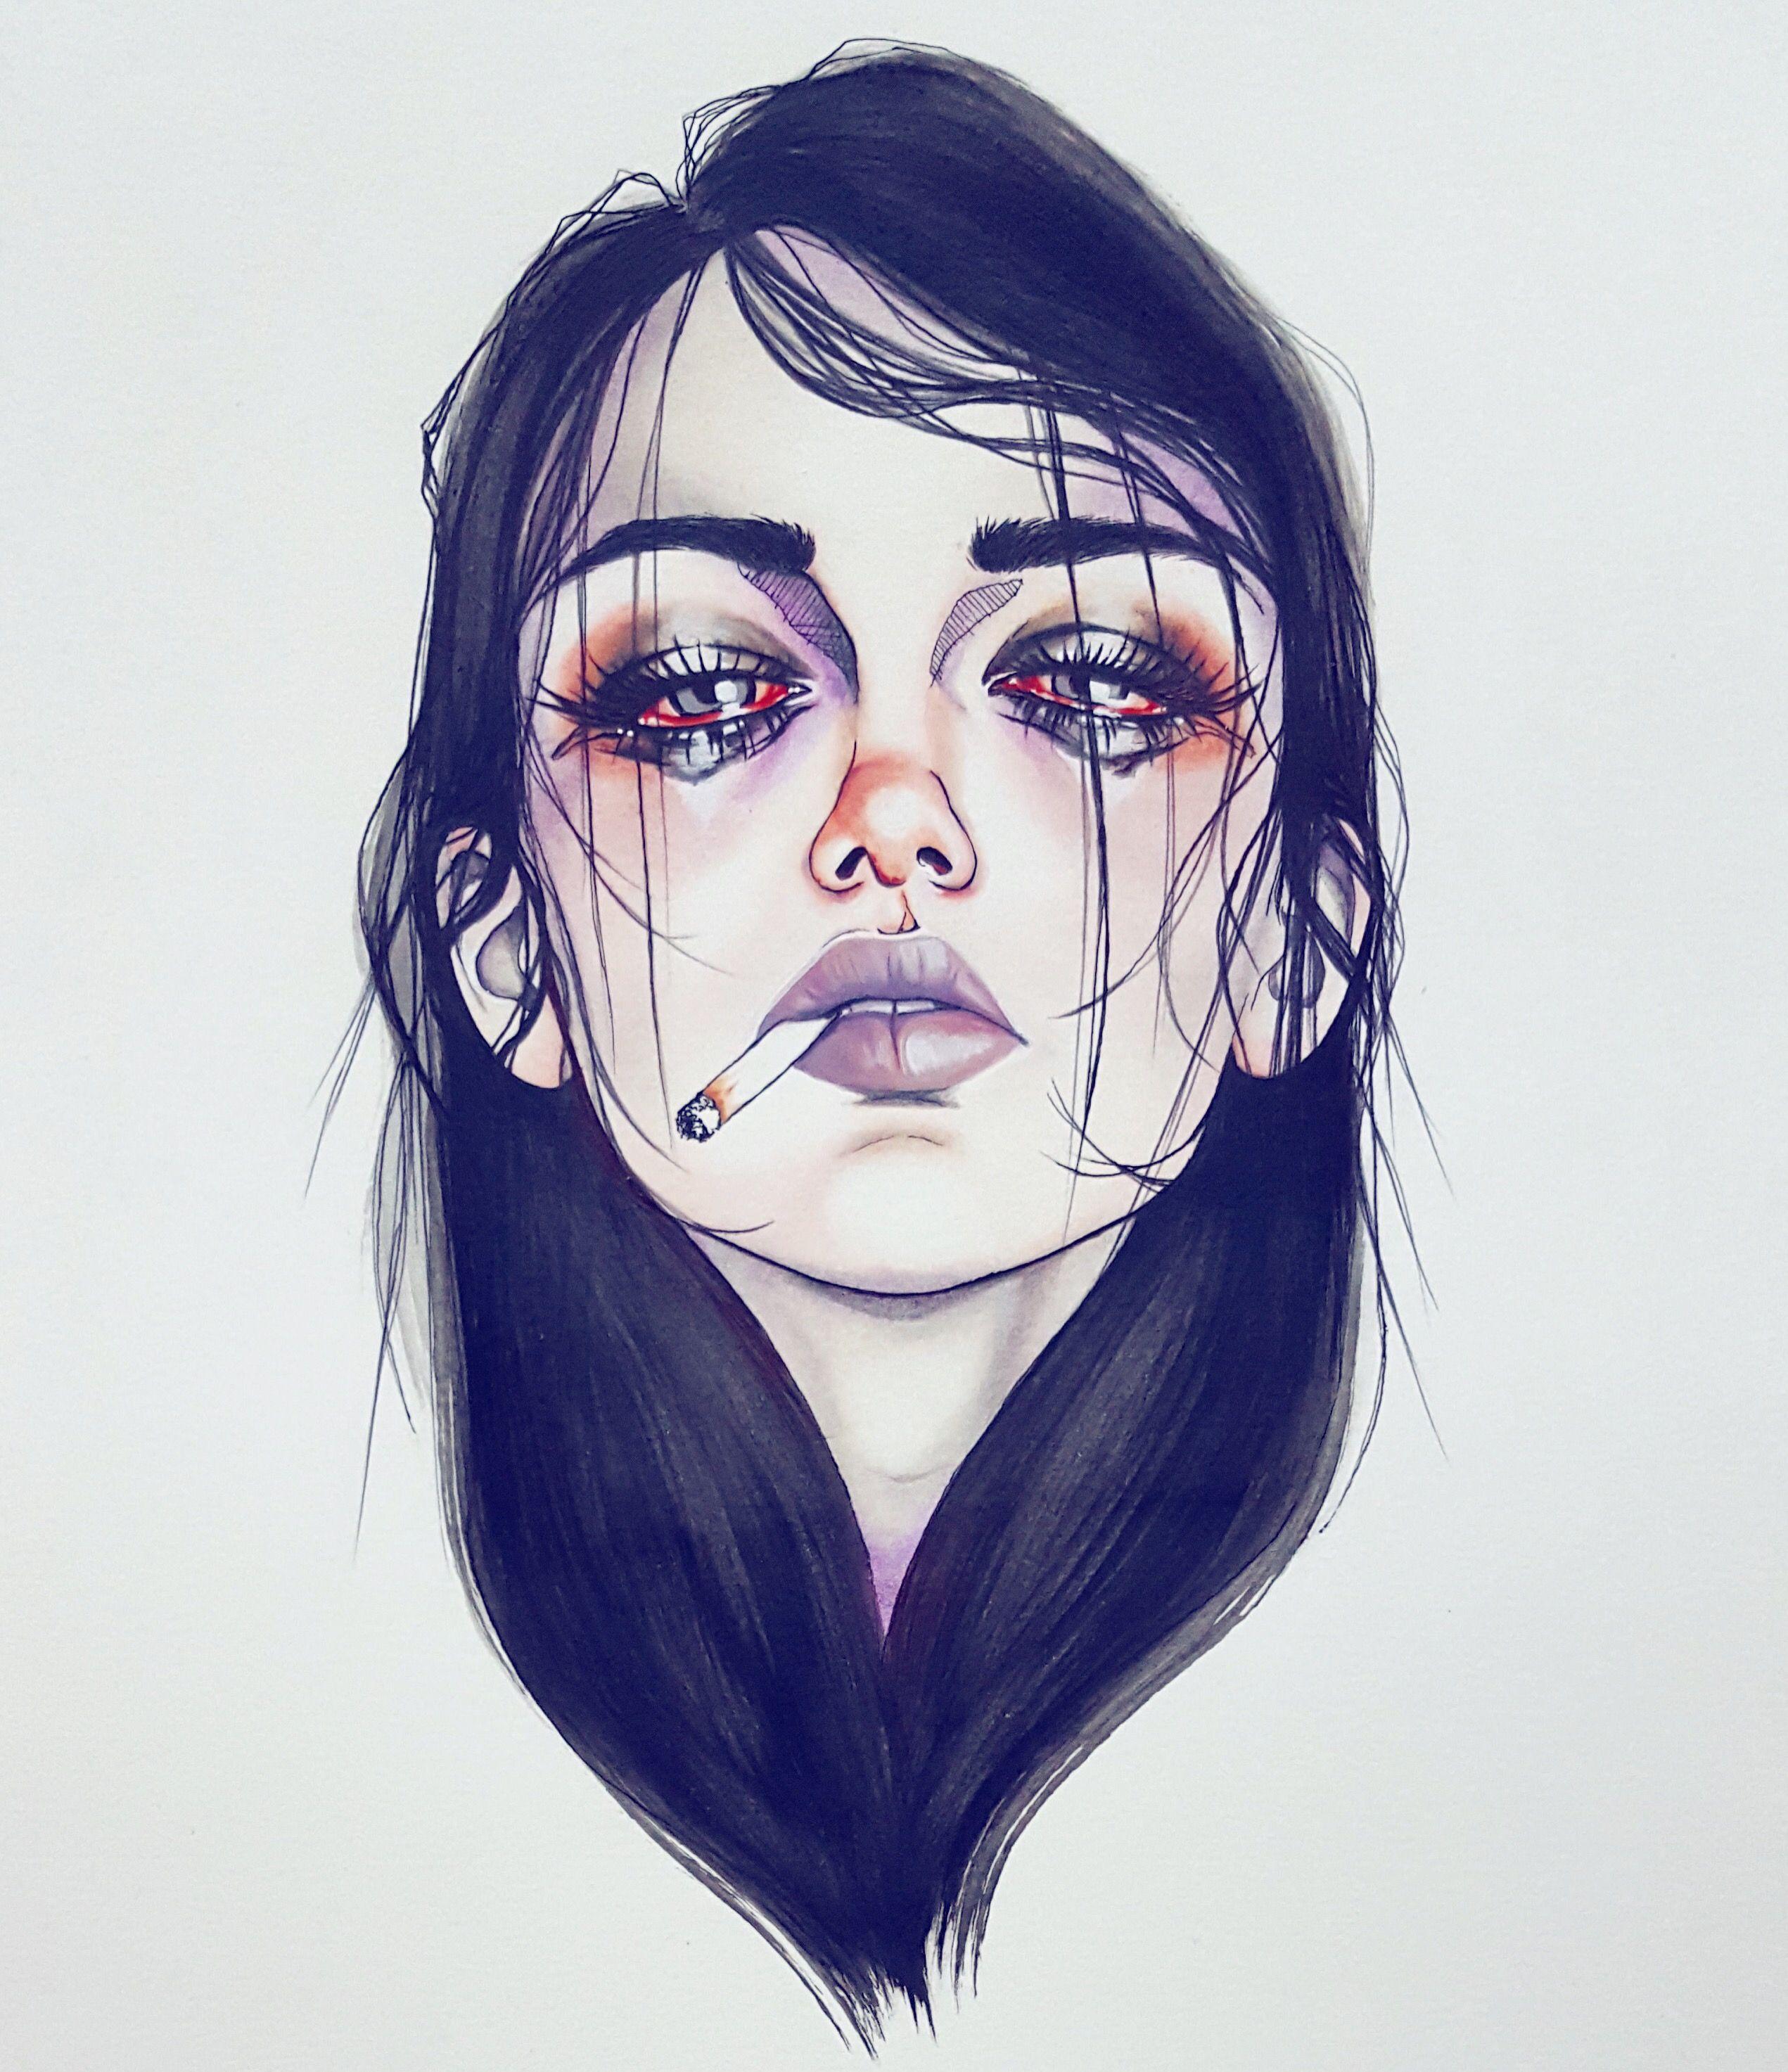 Depressed Girl Drawing at GetDrawings | Free download